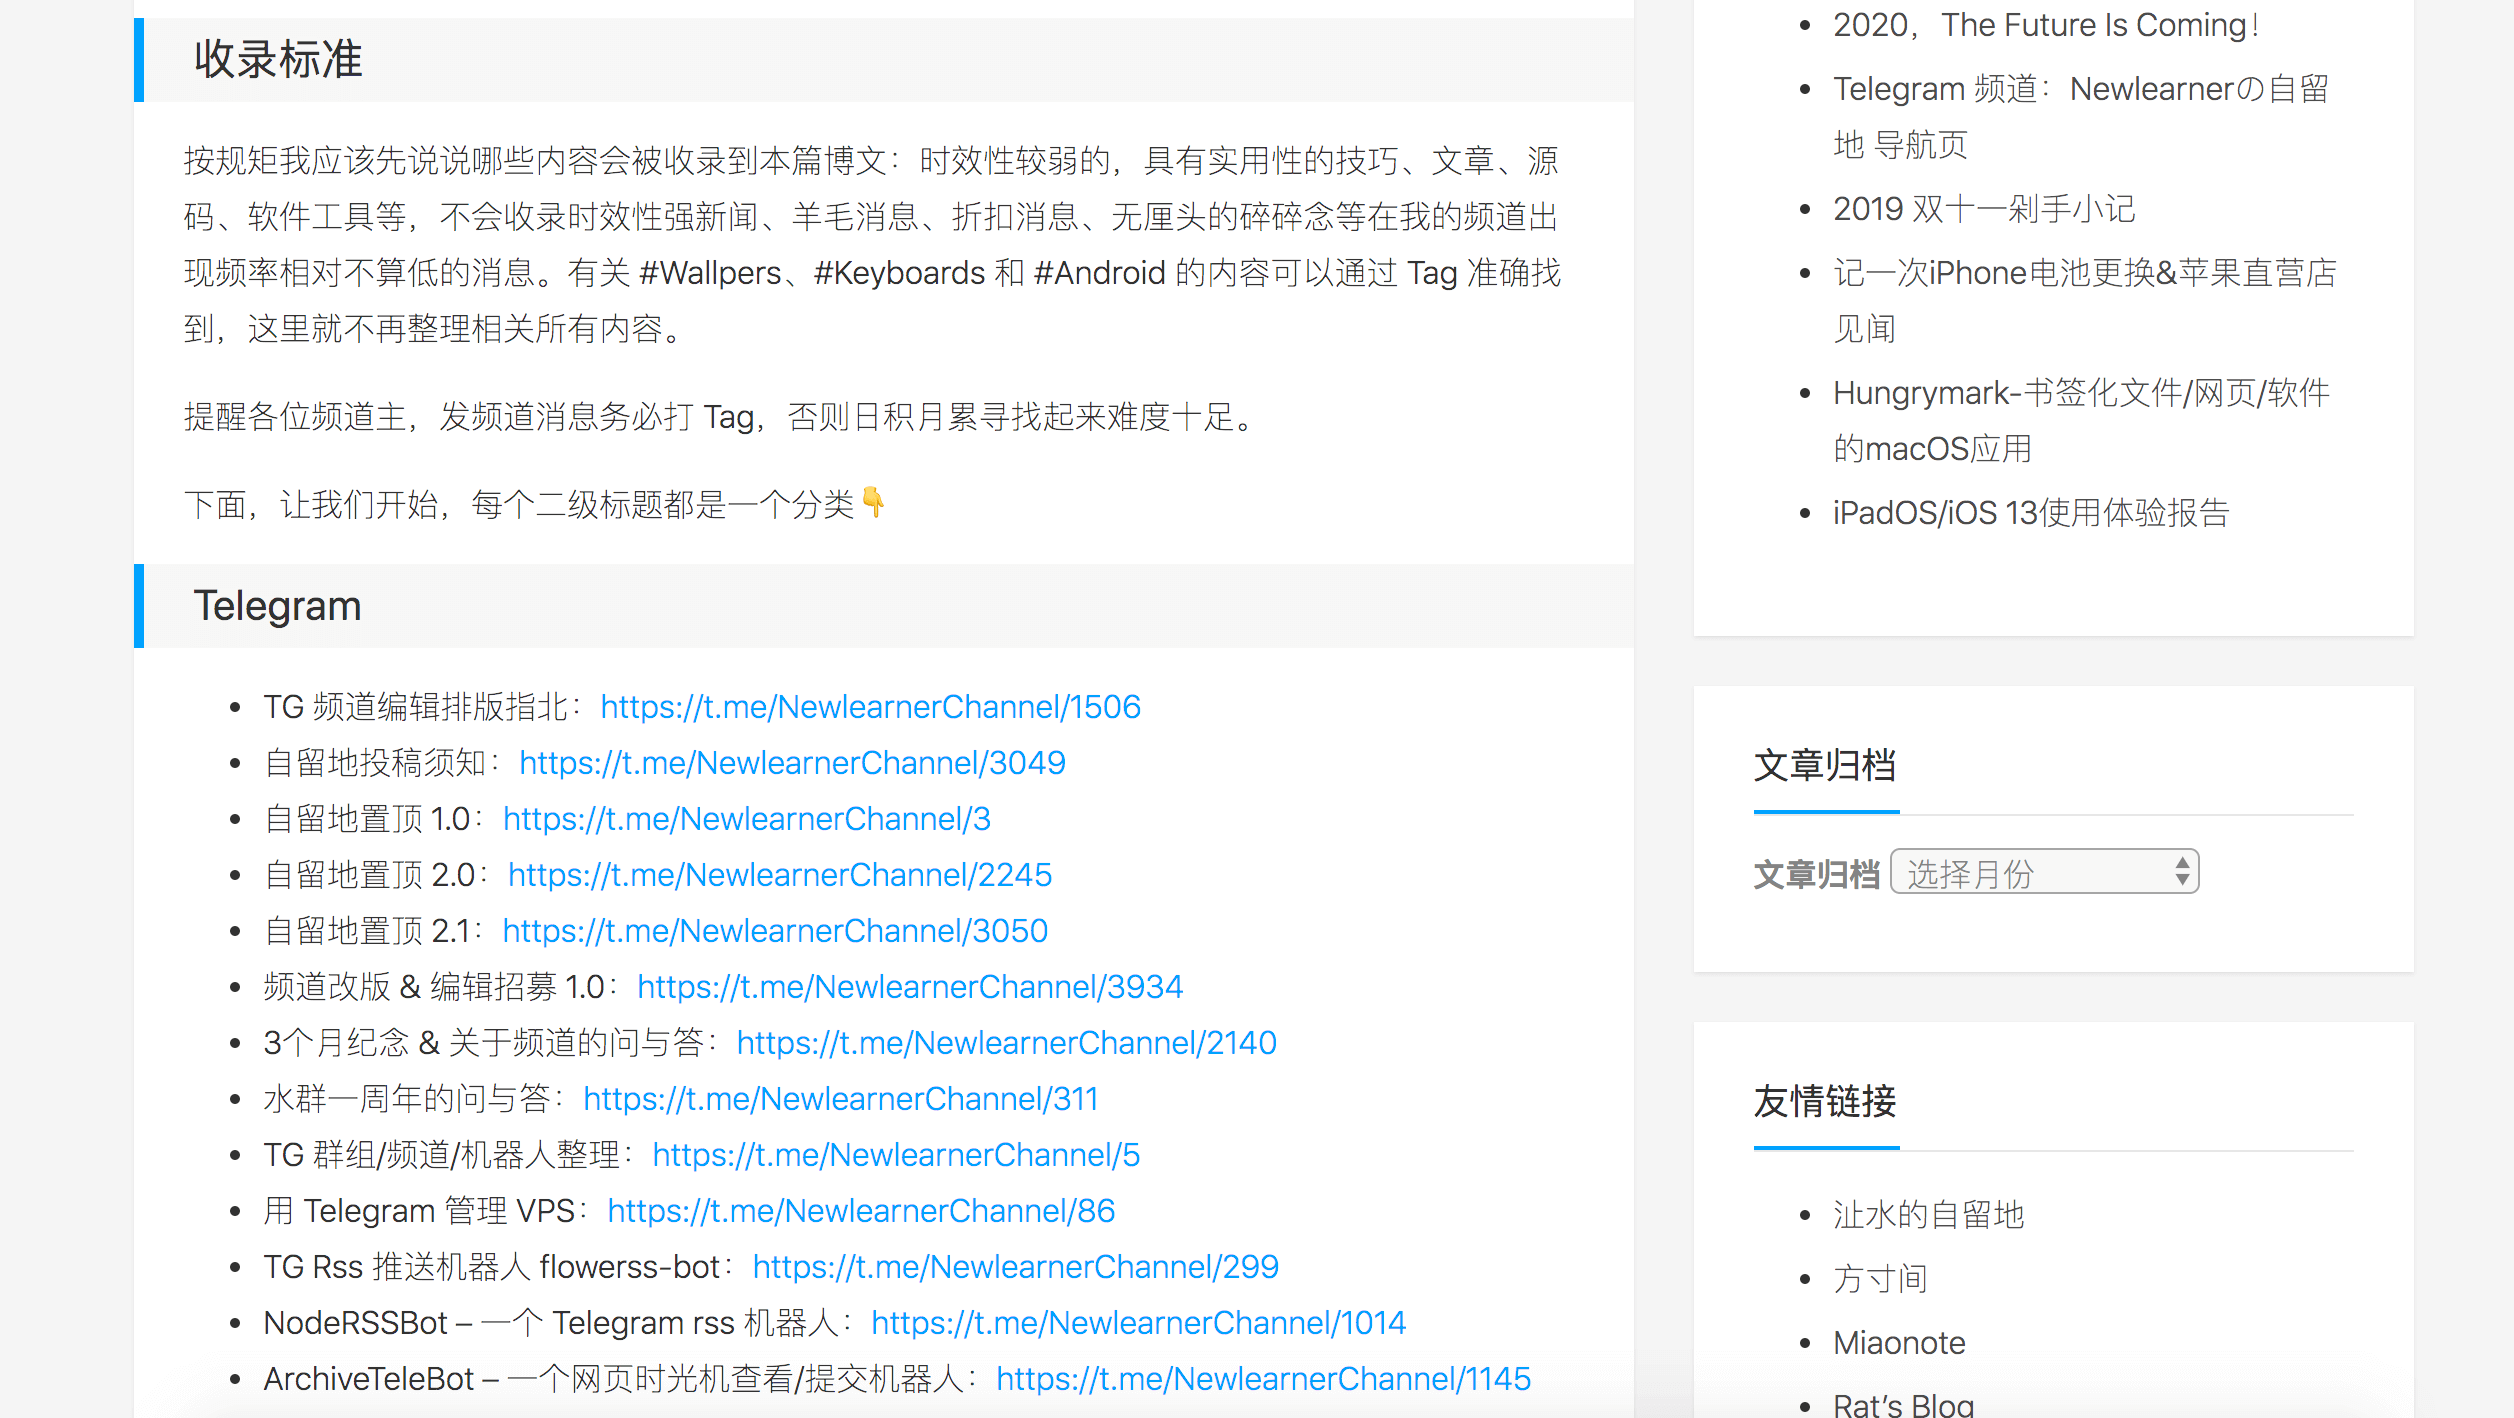 《Telegram 中文搜索方案探索》